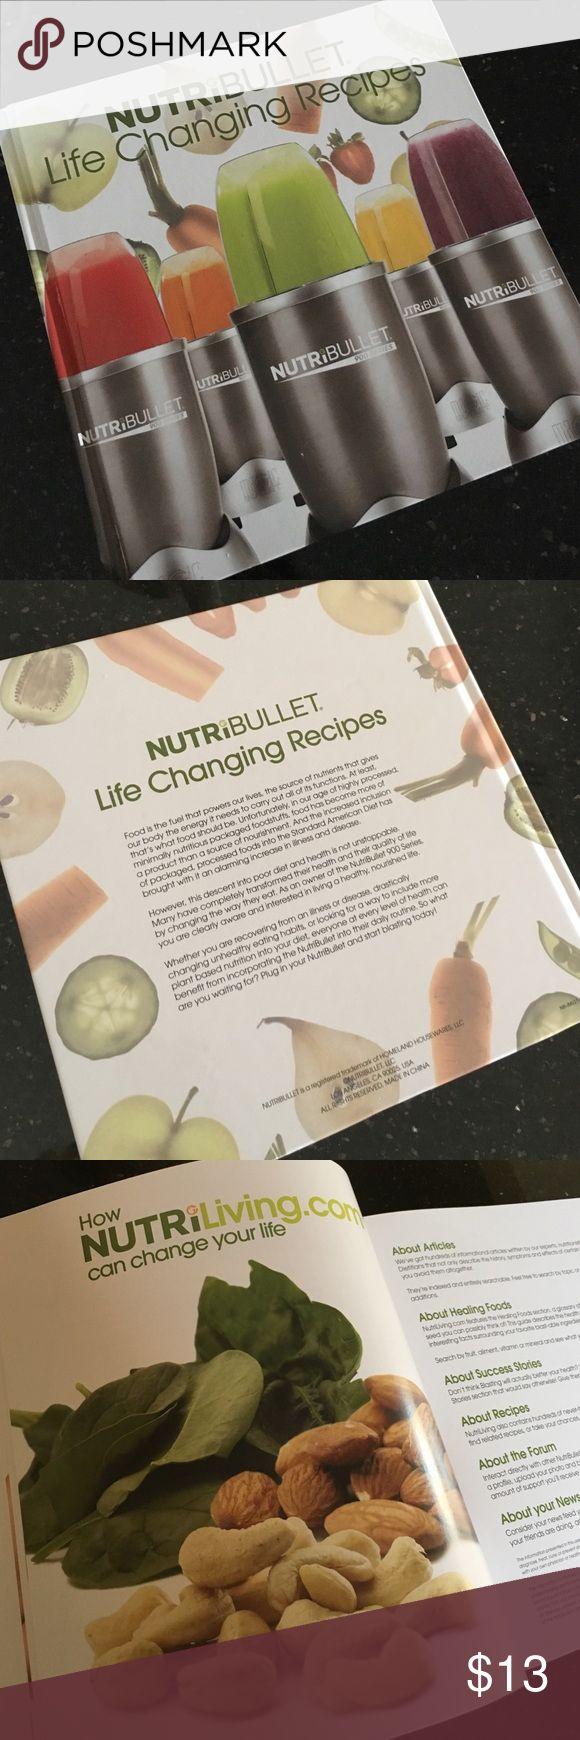 NUTRiBULLET  Life Changing Recipes NutriBullet  150 Pages of Life Changing Recipes. Hardcover. Accessories